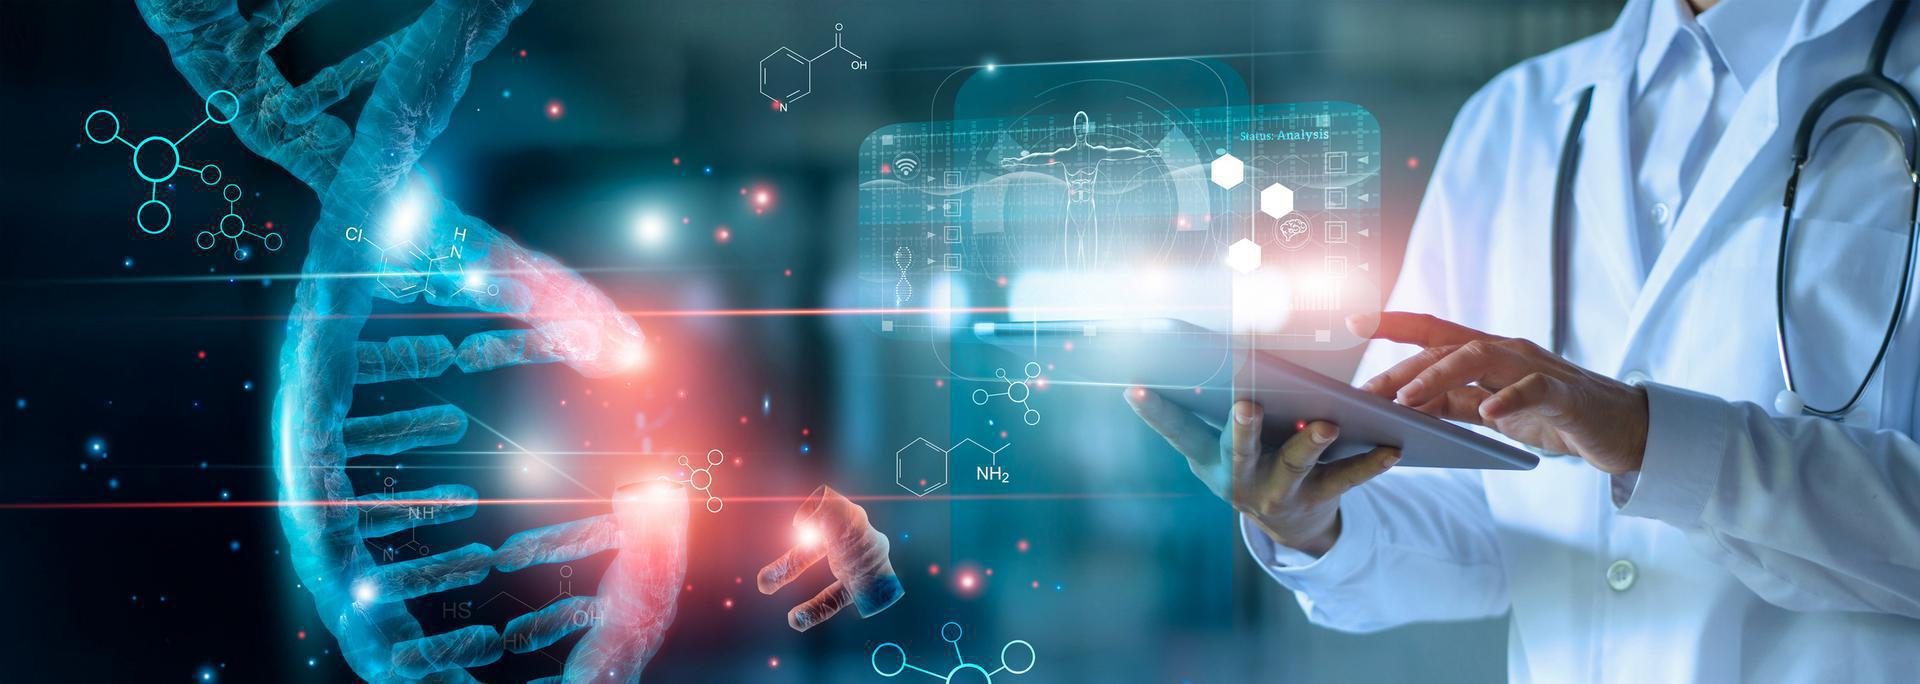 Drug Testing and DNA Testing - Bellevue NE - featured